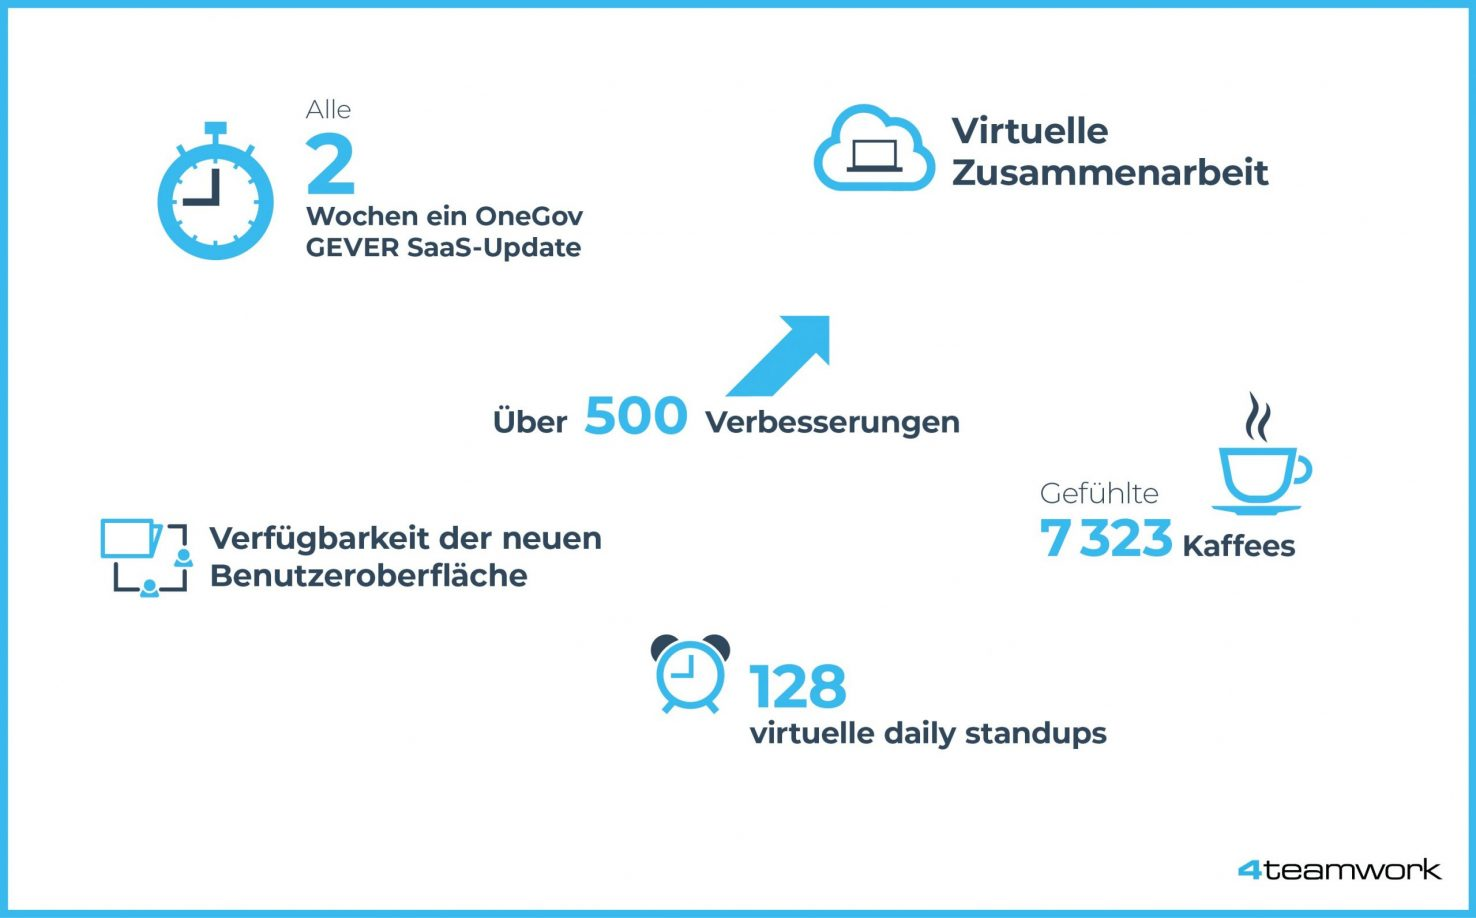 4teamwork Infografik RE 12.08.20